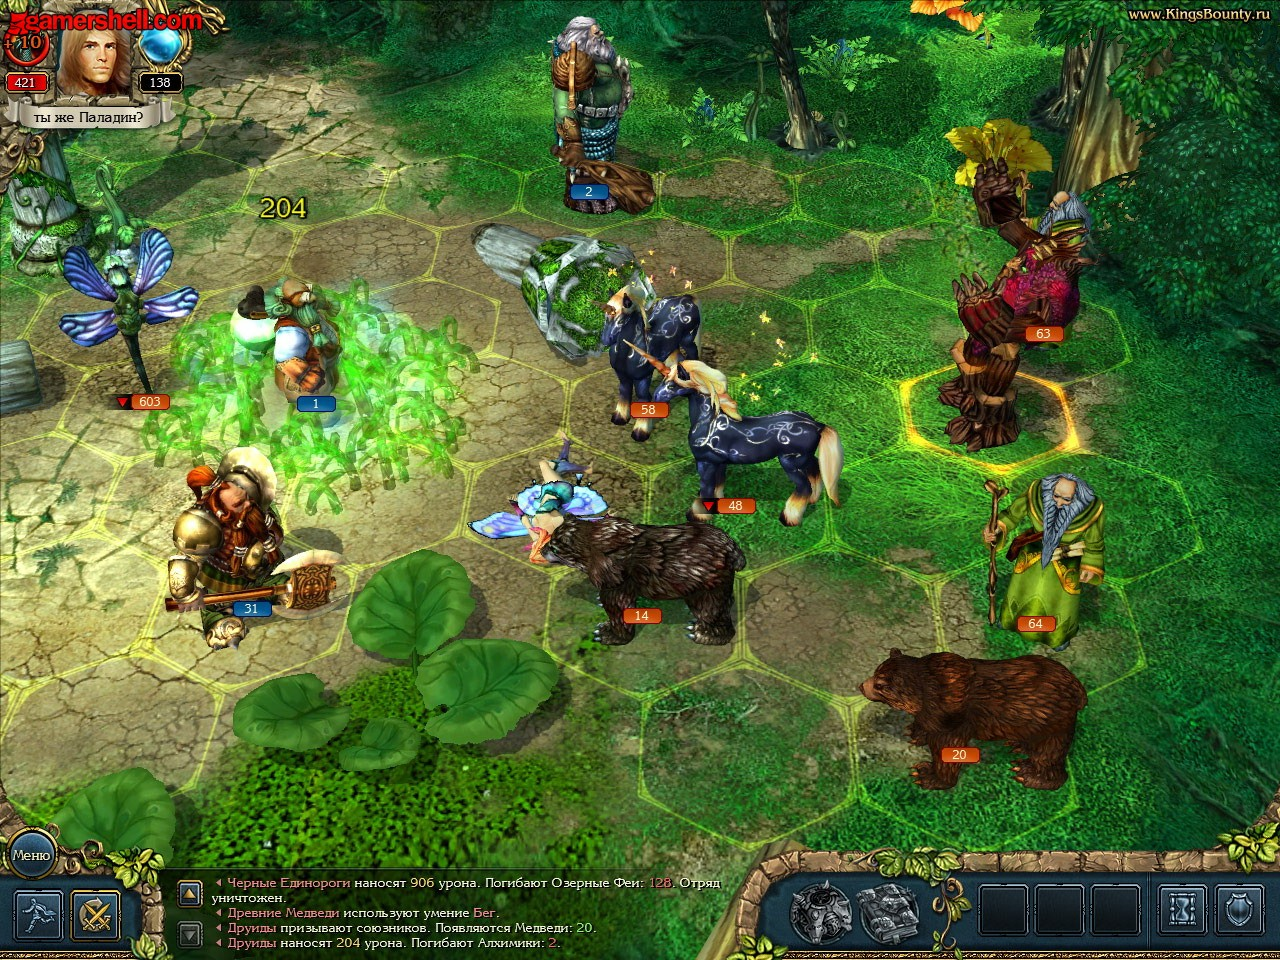 kingsbounty-screenshot1.jpg